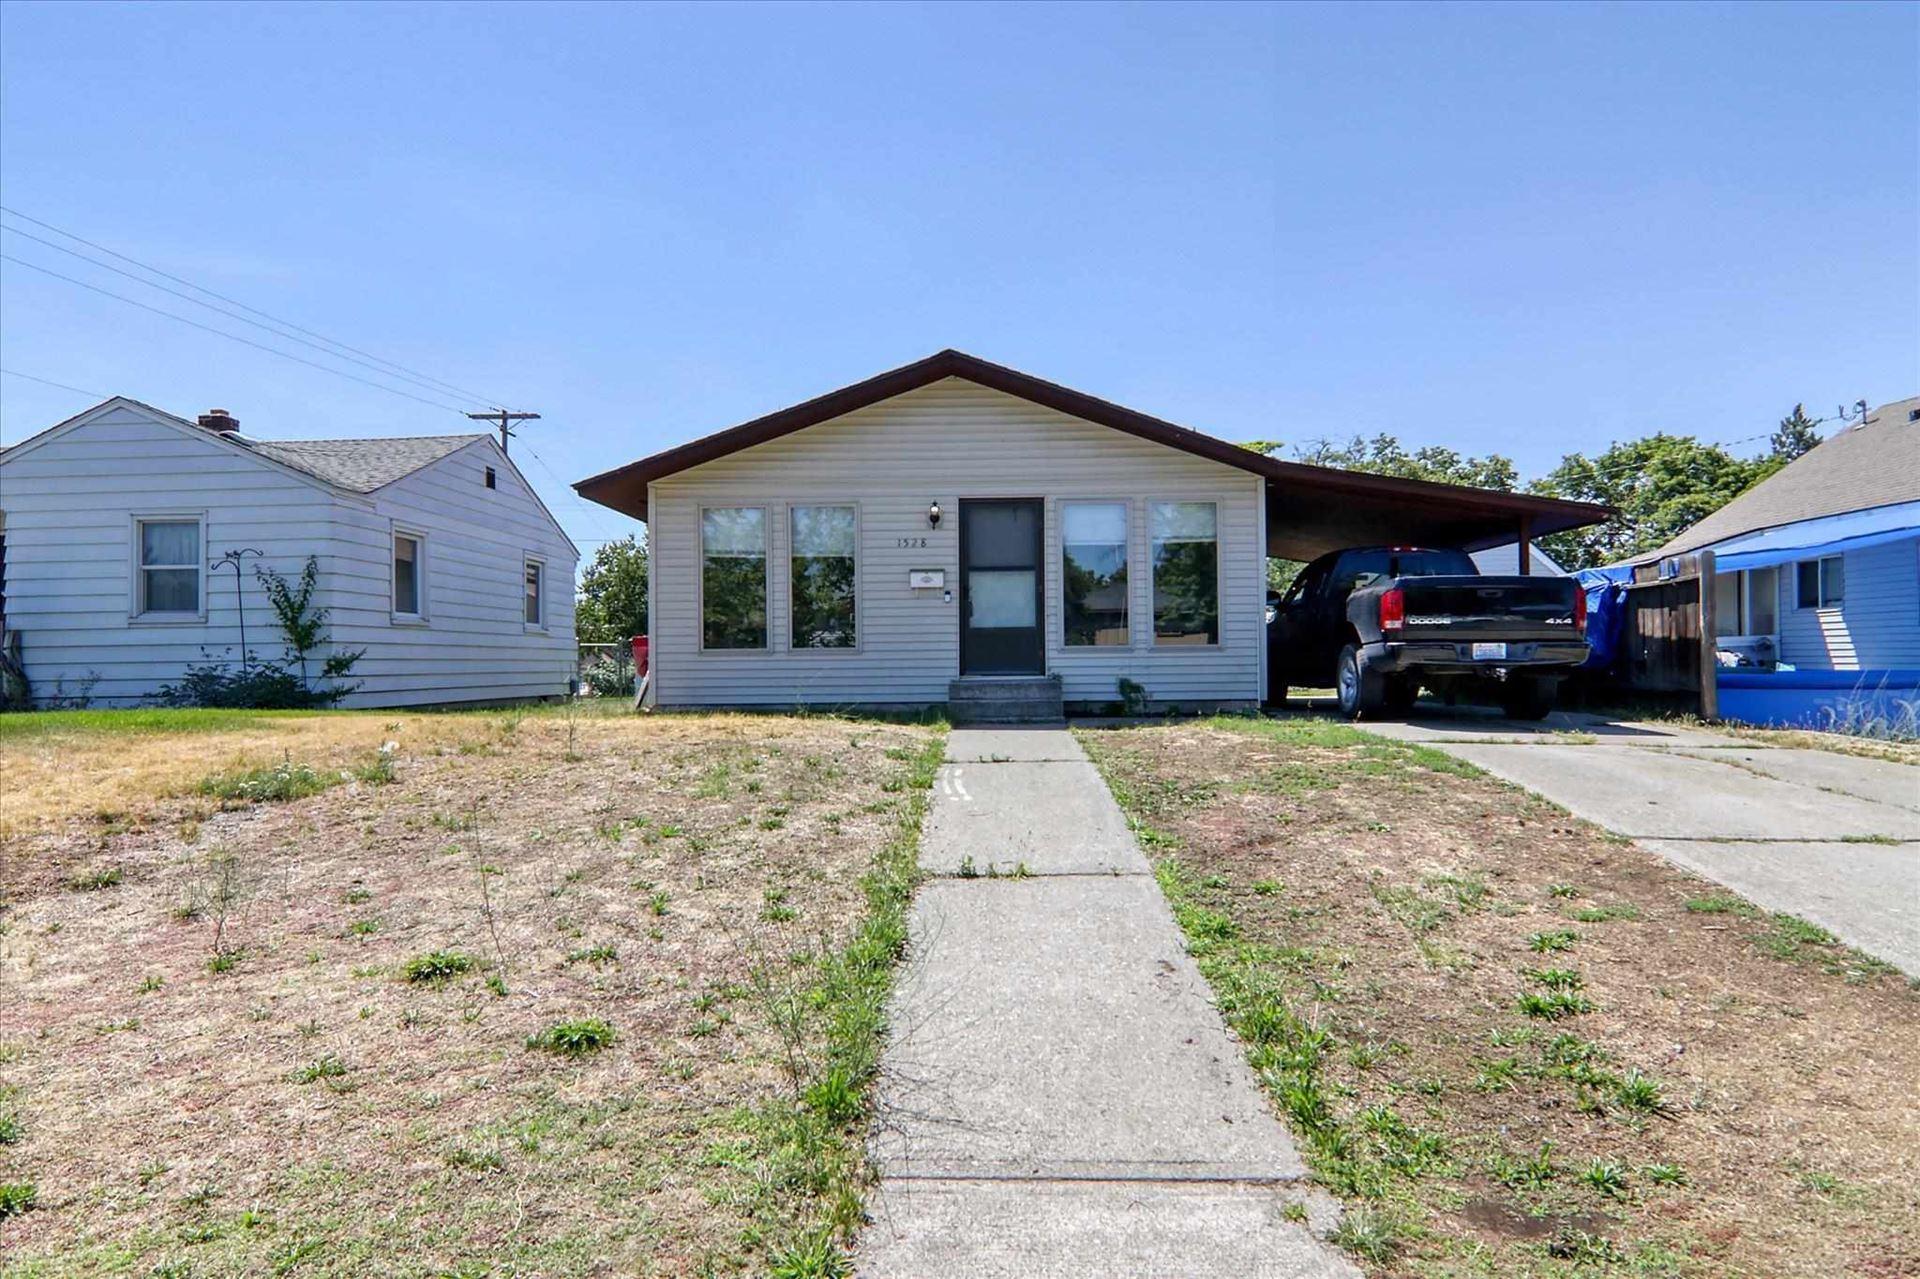 1528 E Columbia Ave, Spokane, WA 99208 - #: 202118461